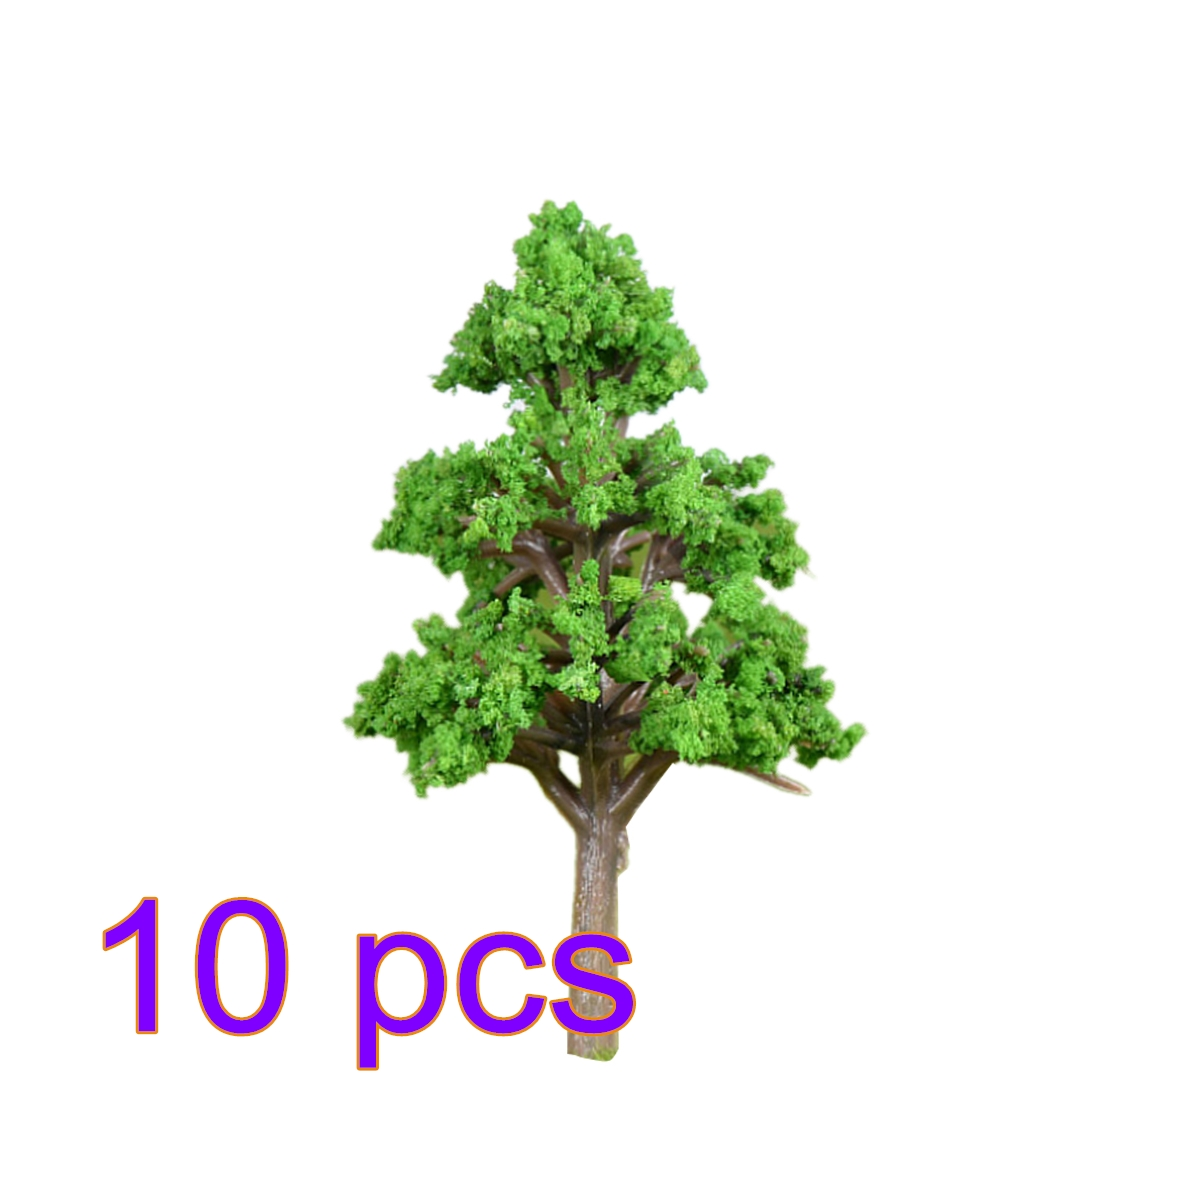 10 Pcs 4.3/6.4/8.7cm HO 1:85 Scale Medium Size Pine Tree Model Railroad Architecture Diorama Tree For DIY Scenery Landscape